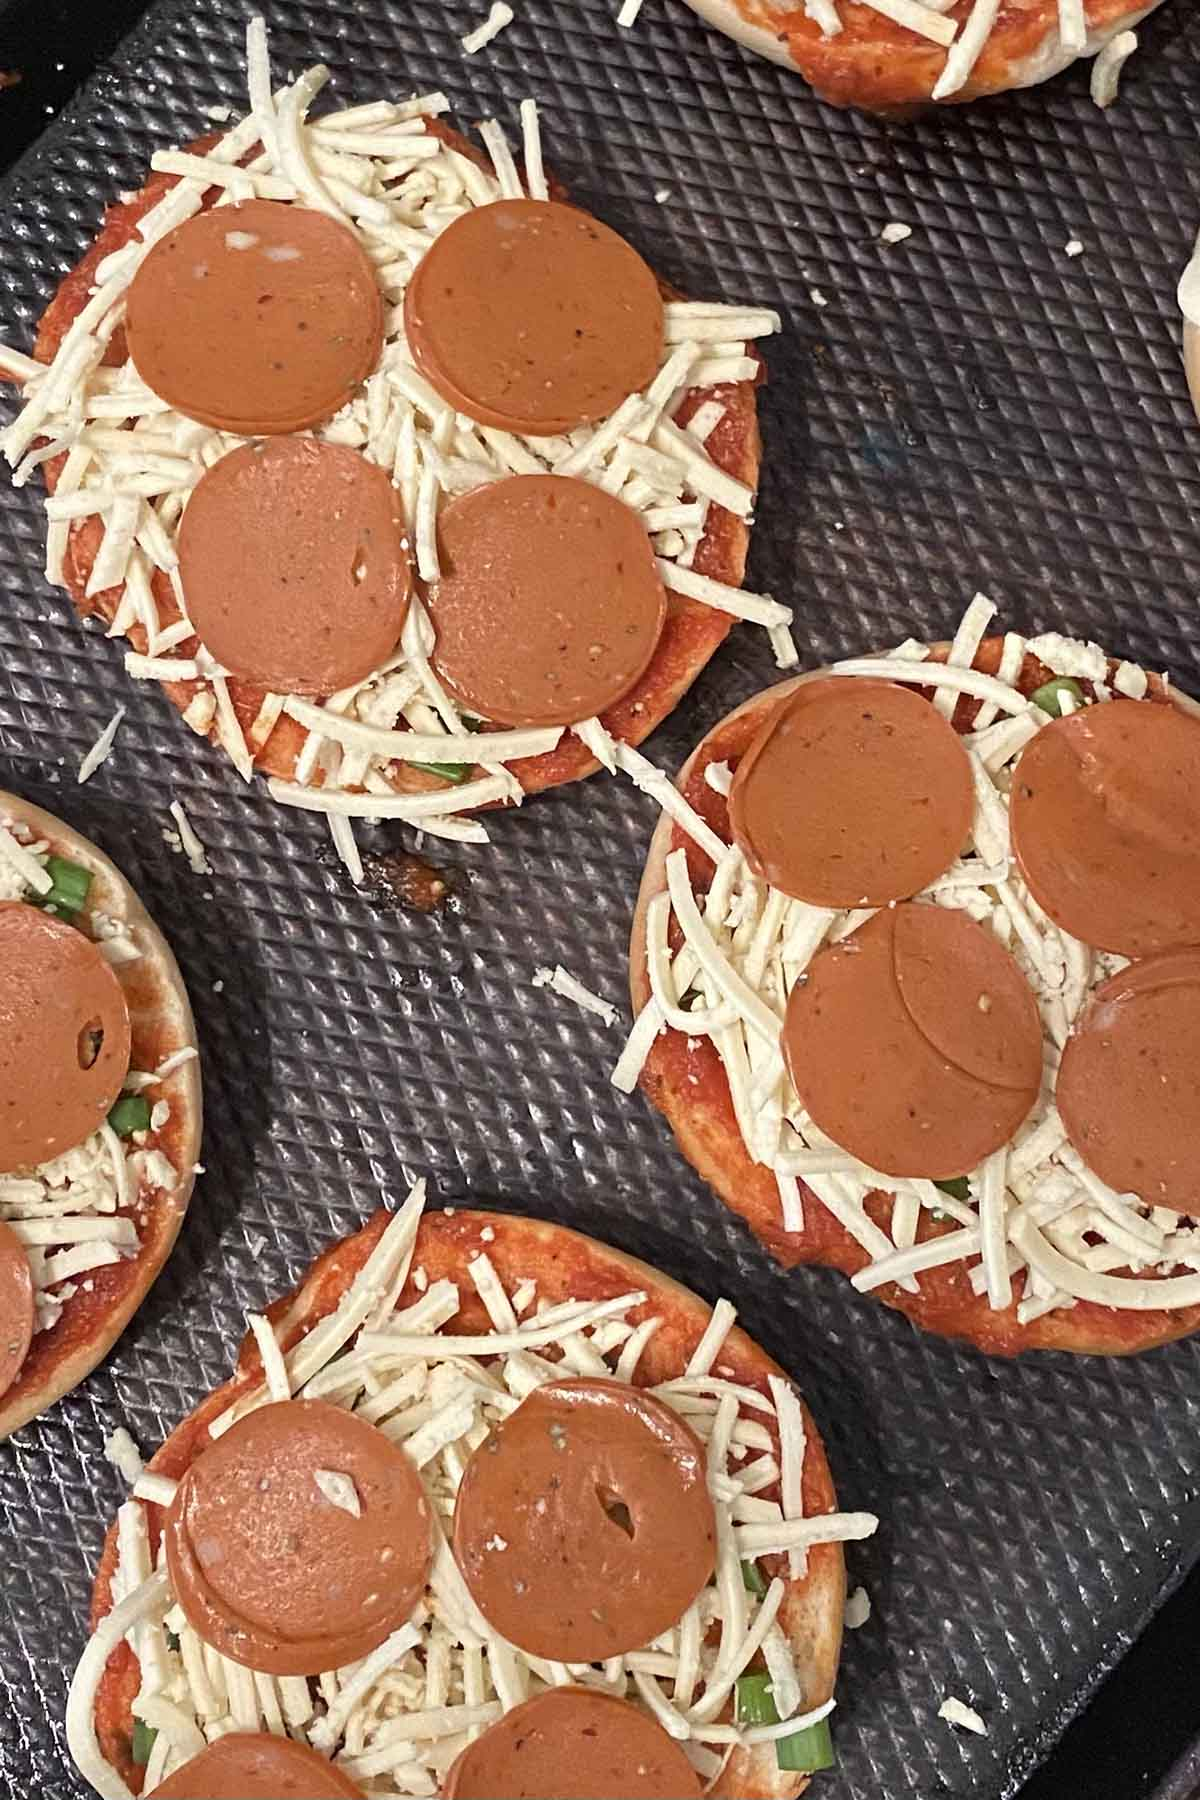 vegan bagel pizzas with Yves Veggie Pepperoni, before baking